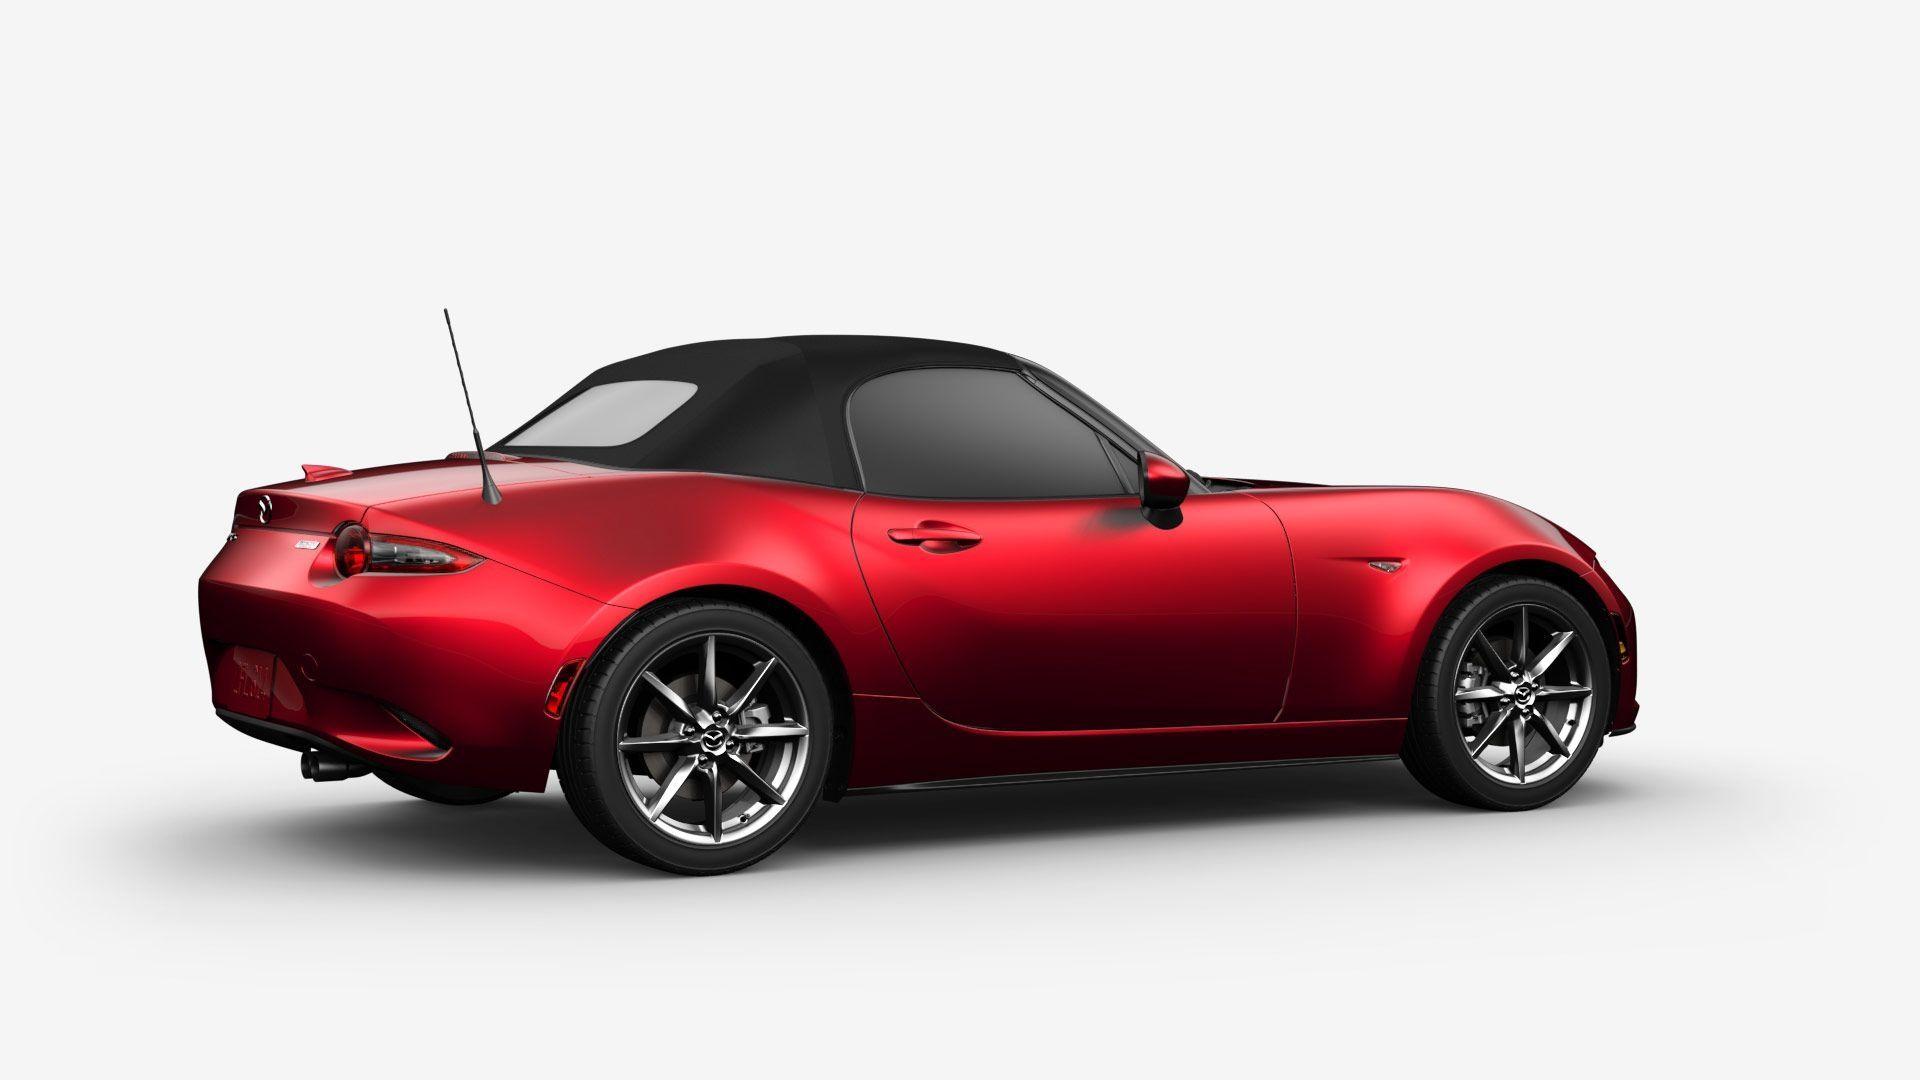 Kekurangan Mazda Mx 5 2018 Top Model Tahun Ini